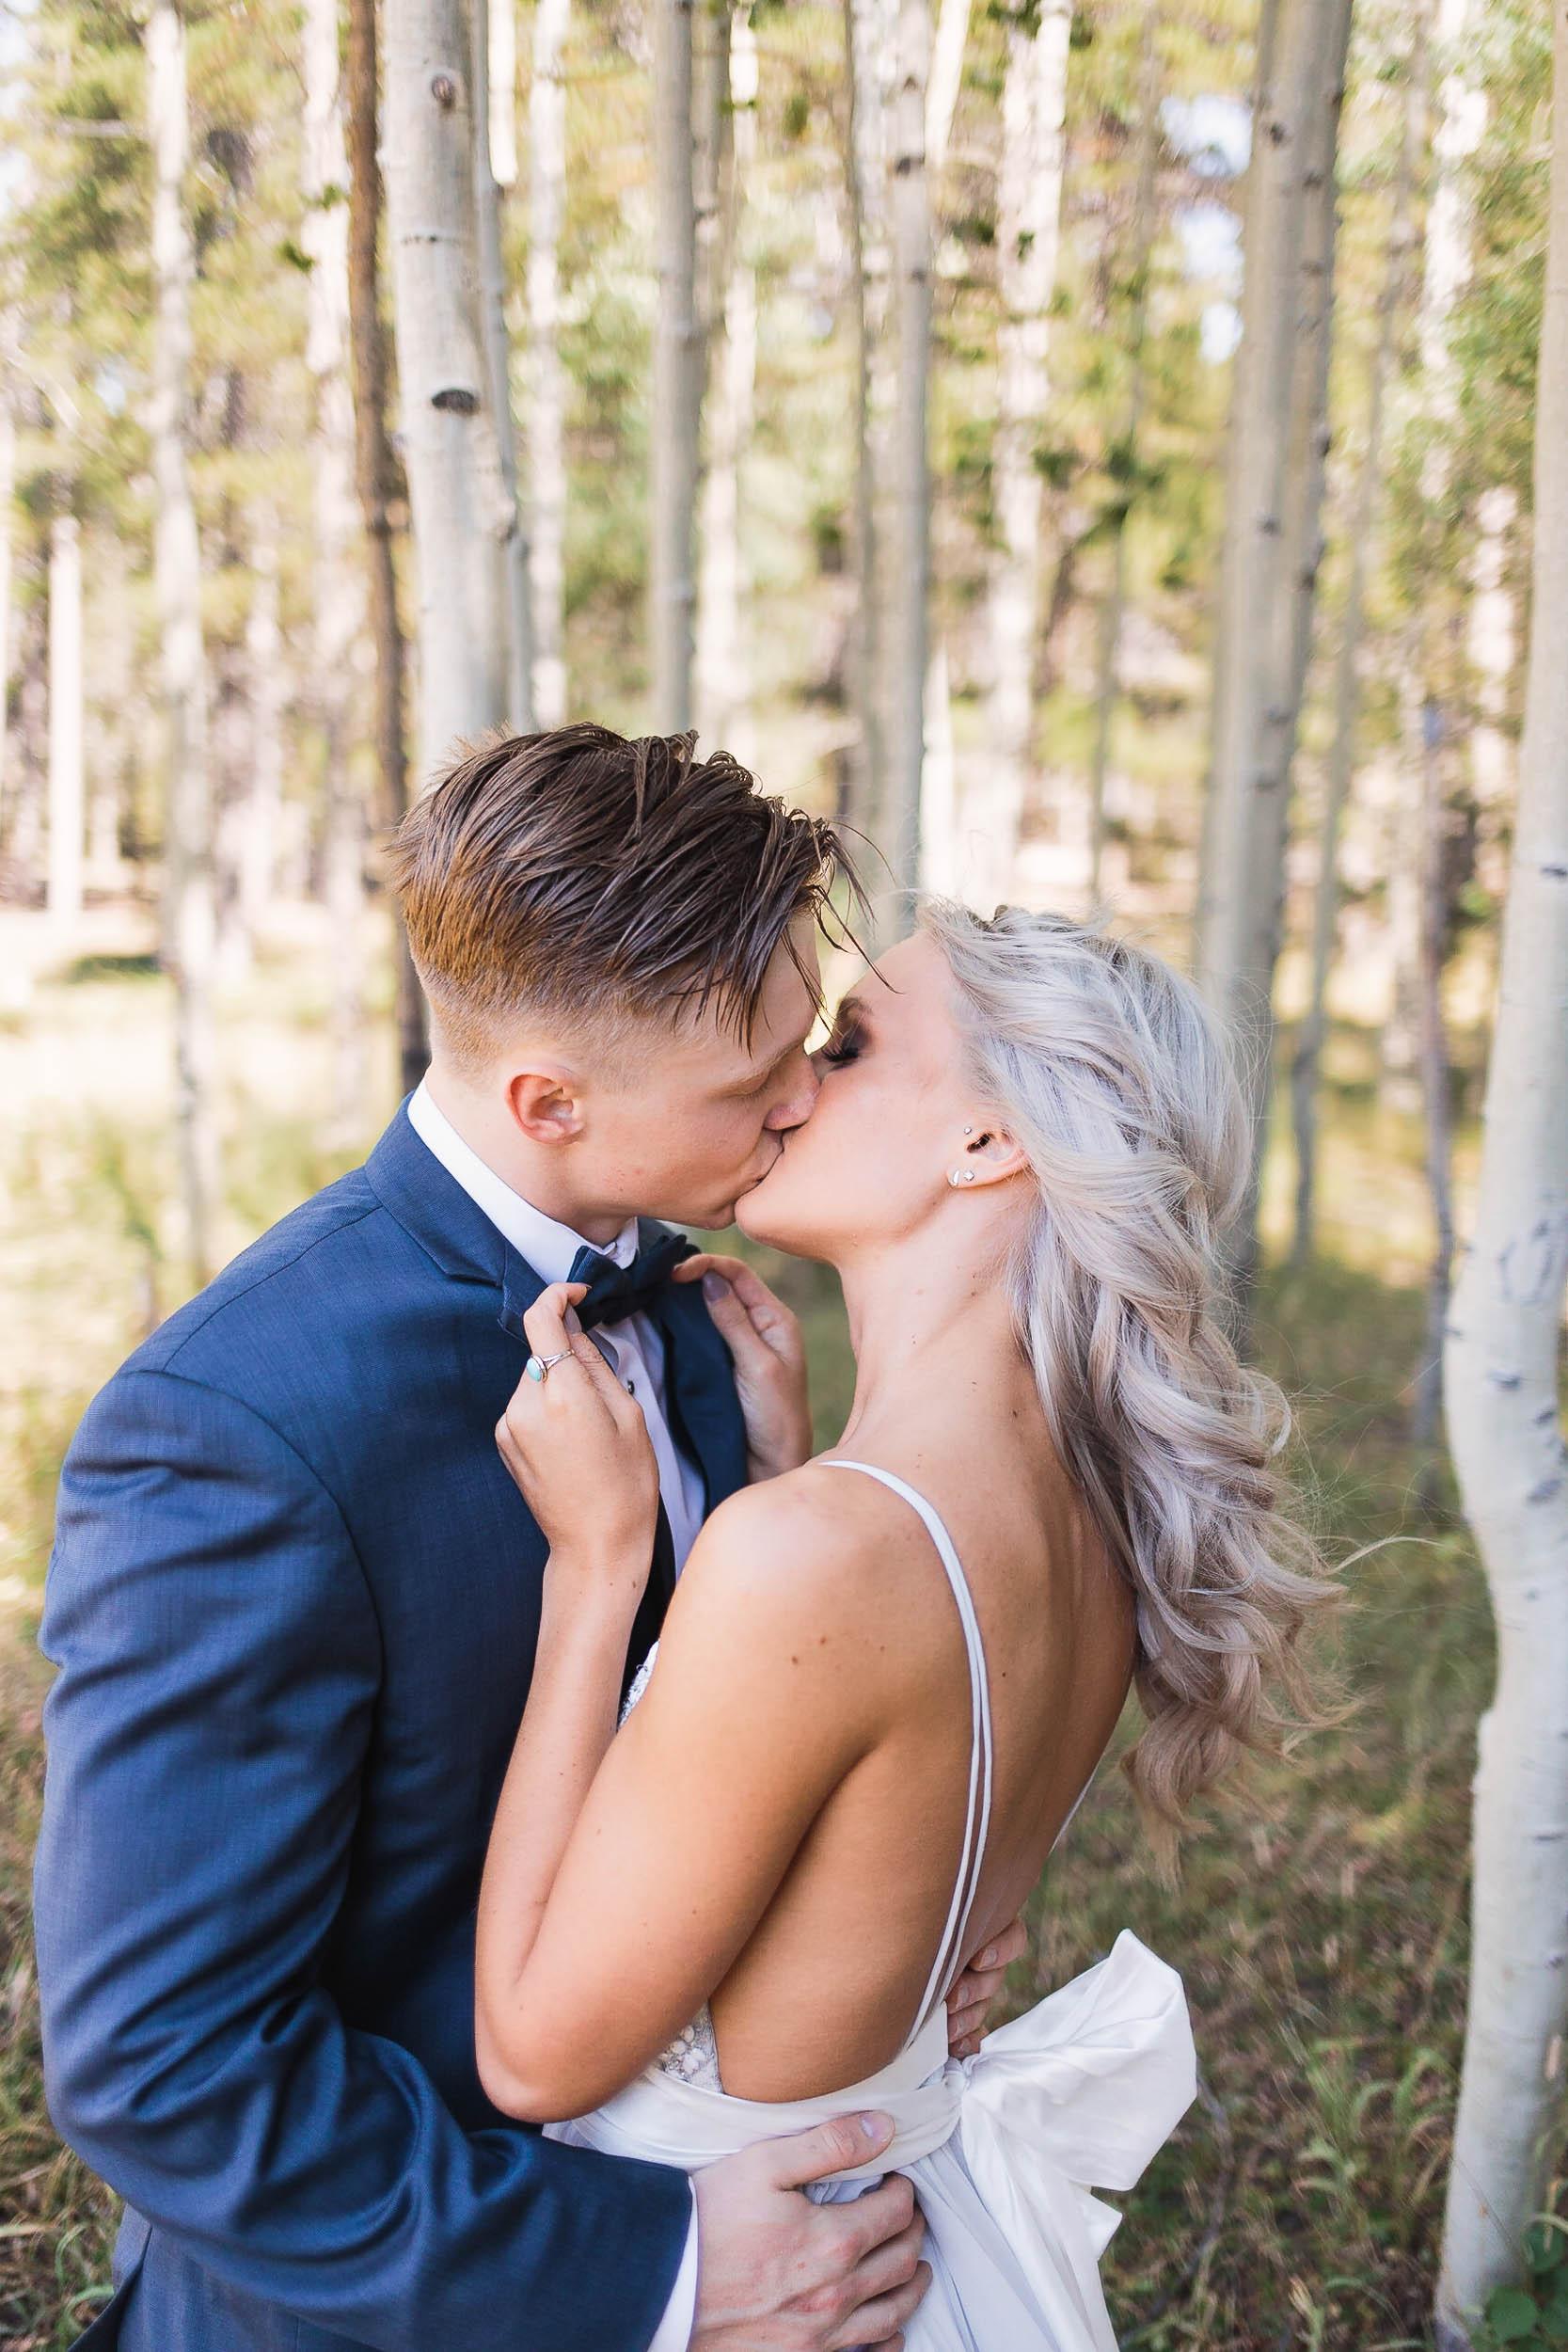 Bride and groom intimate wedding day portraits Casper Wyoming